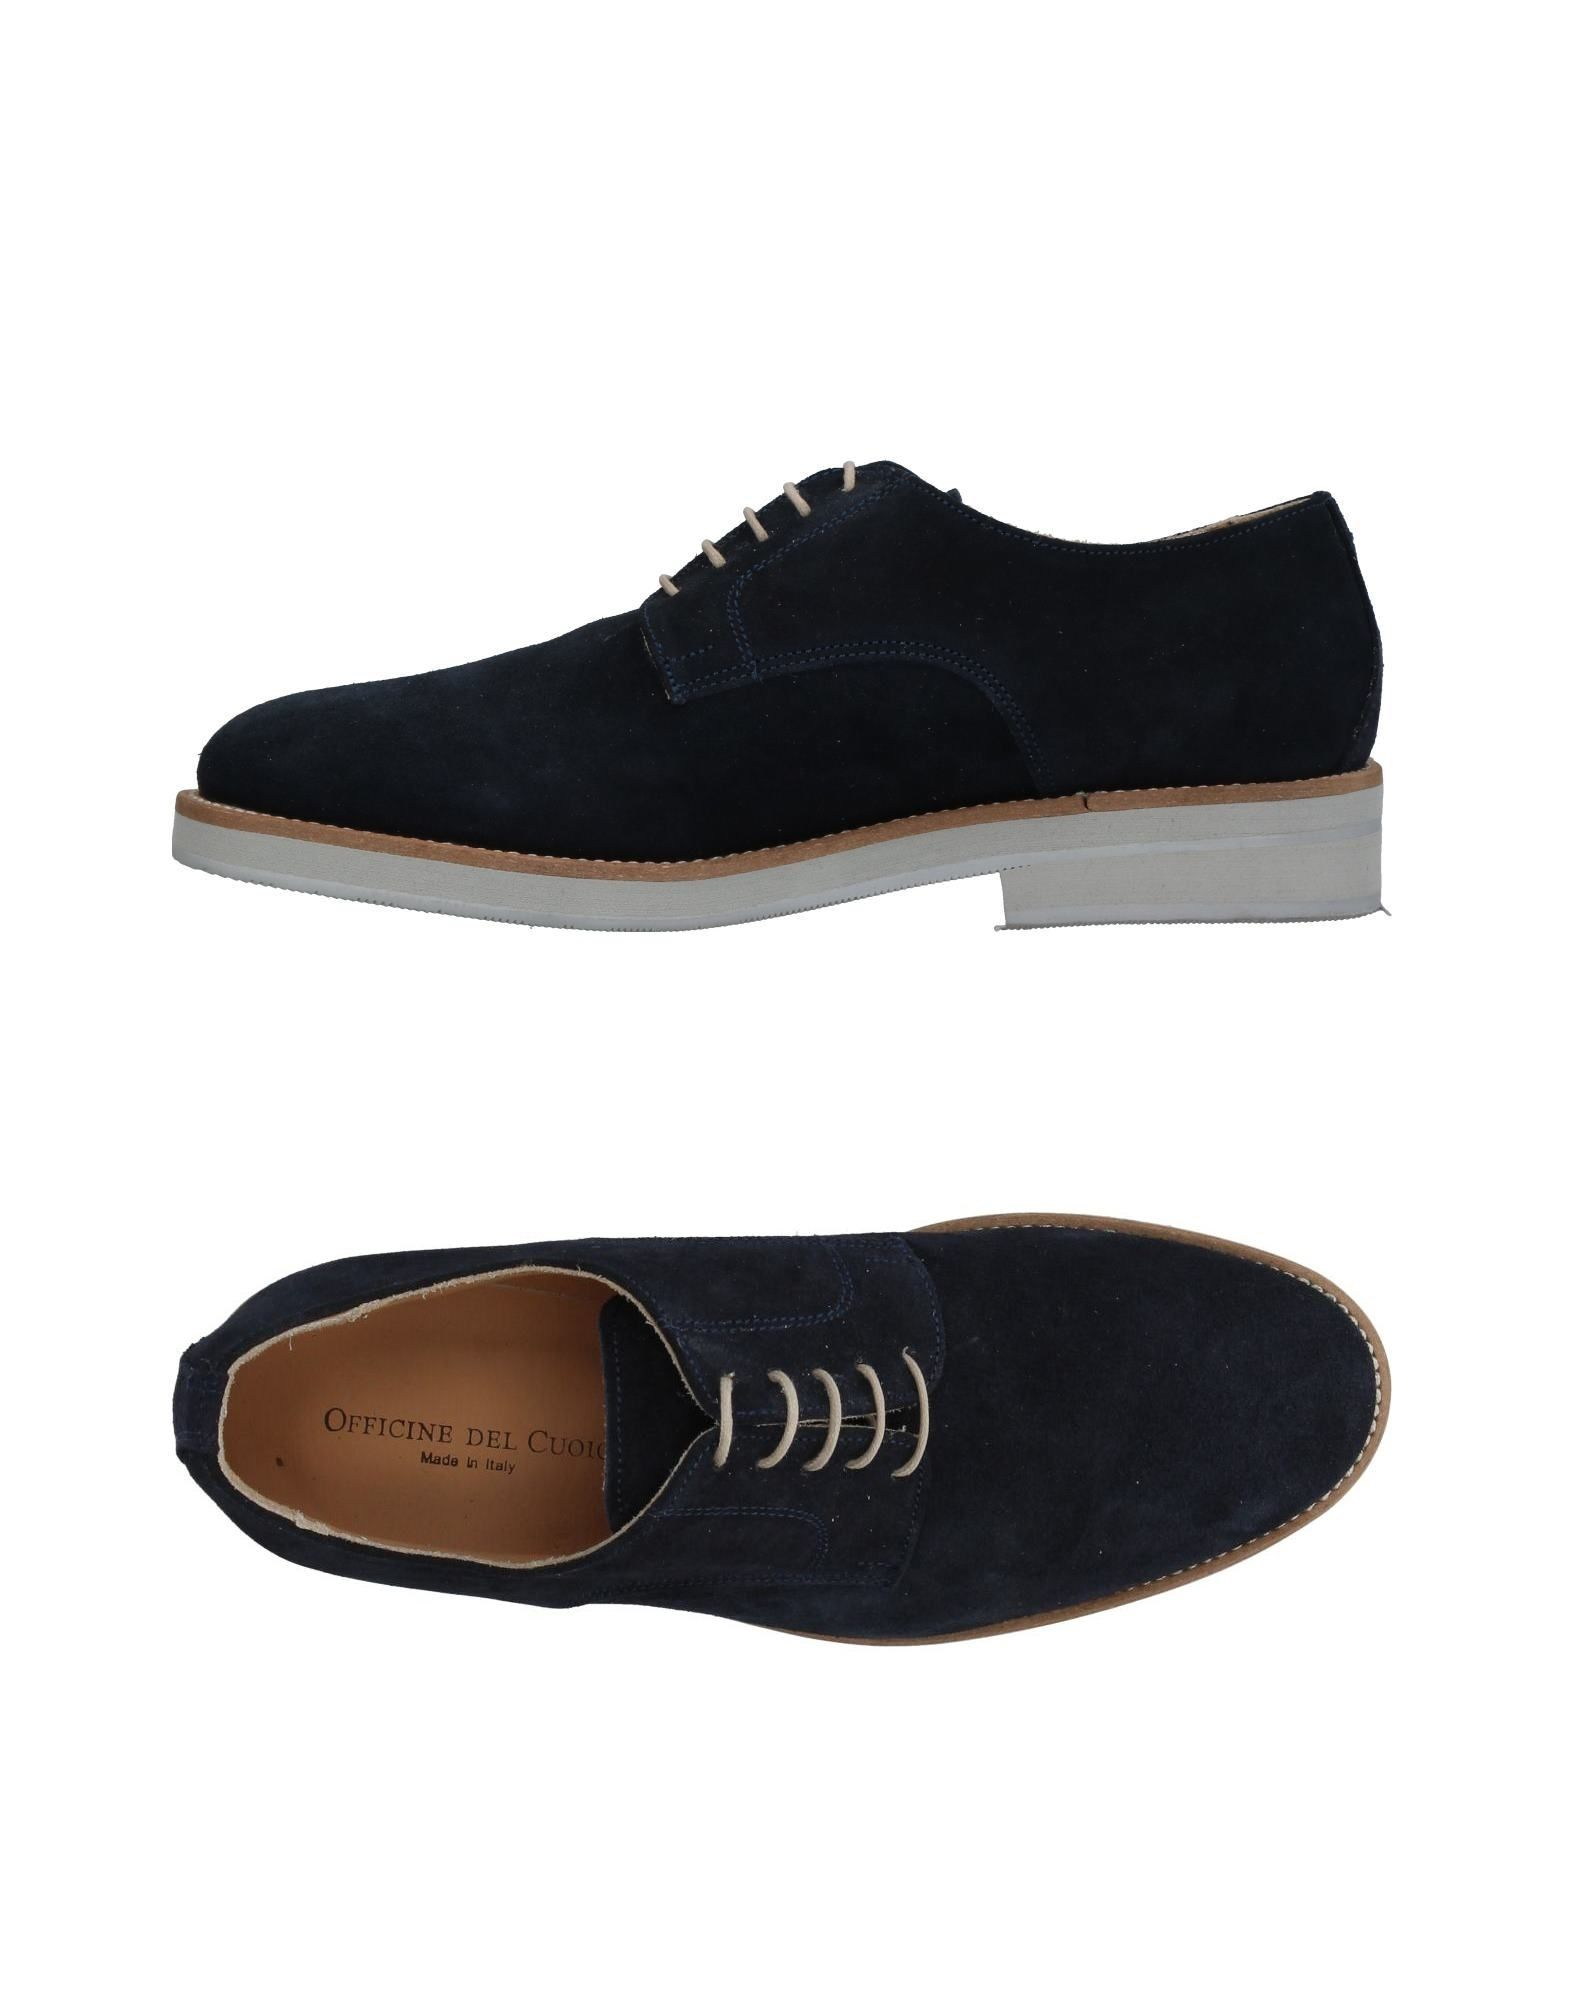 Officine Del Cuoio Schnürschuhe Herren  11371638KA Neue Schuhe